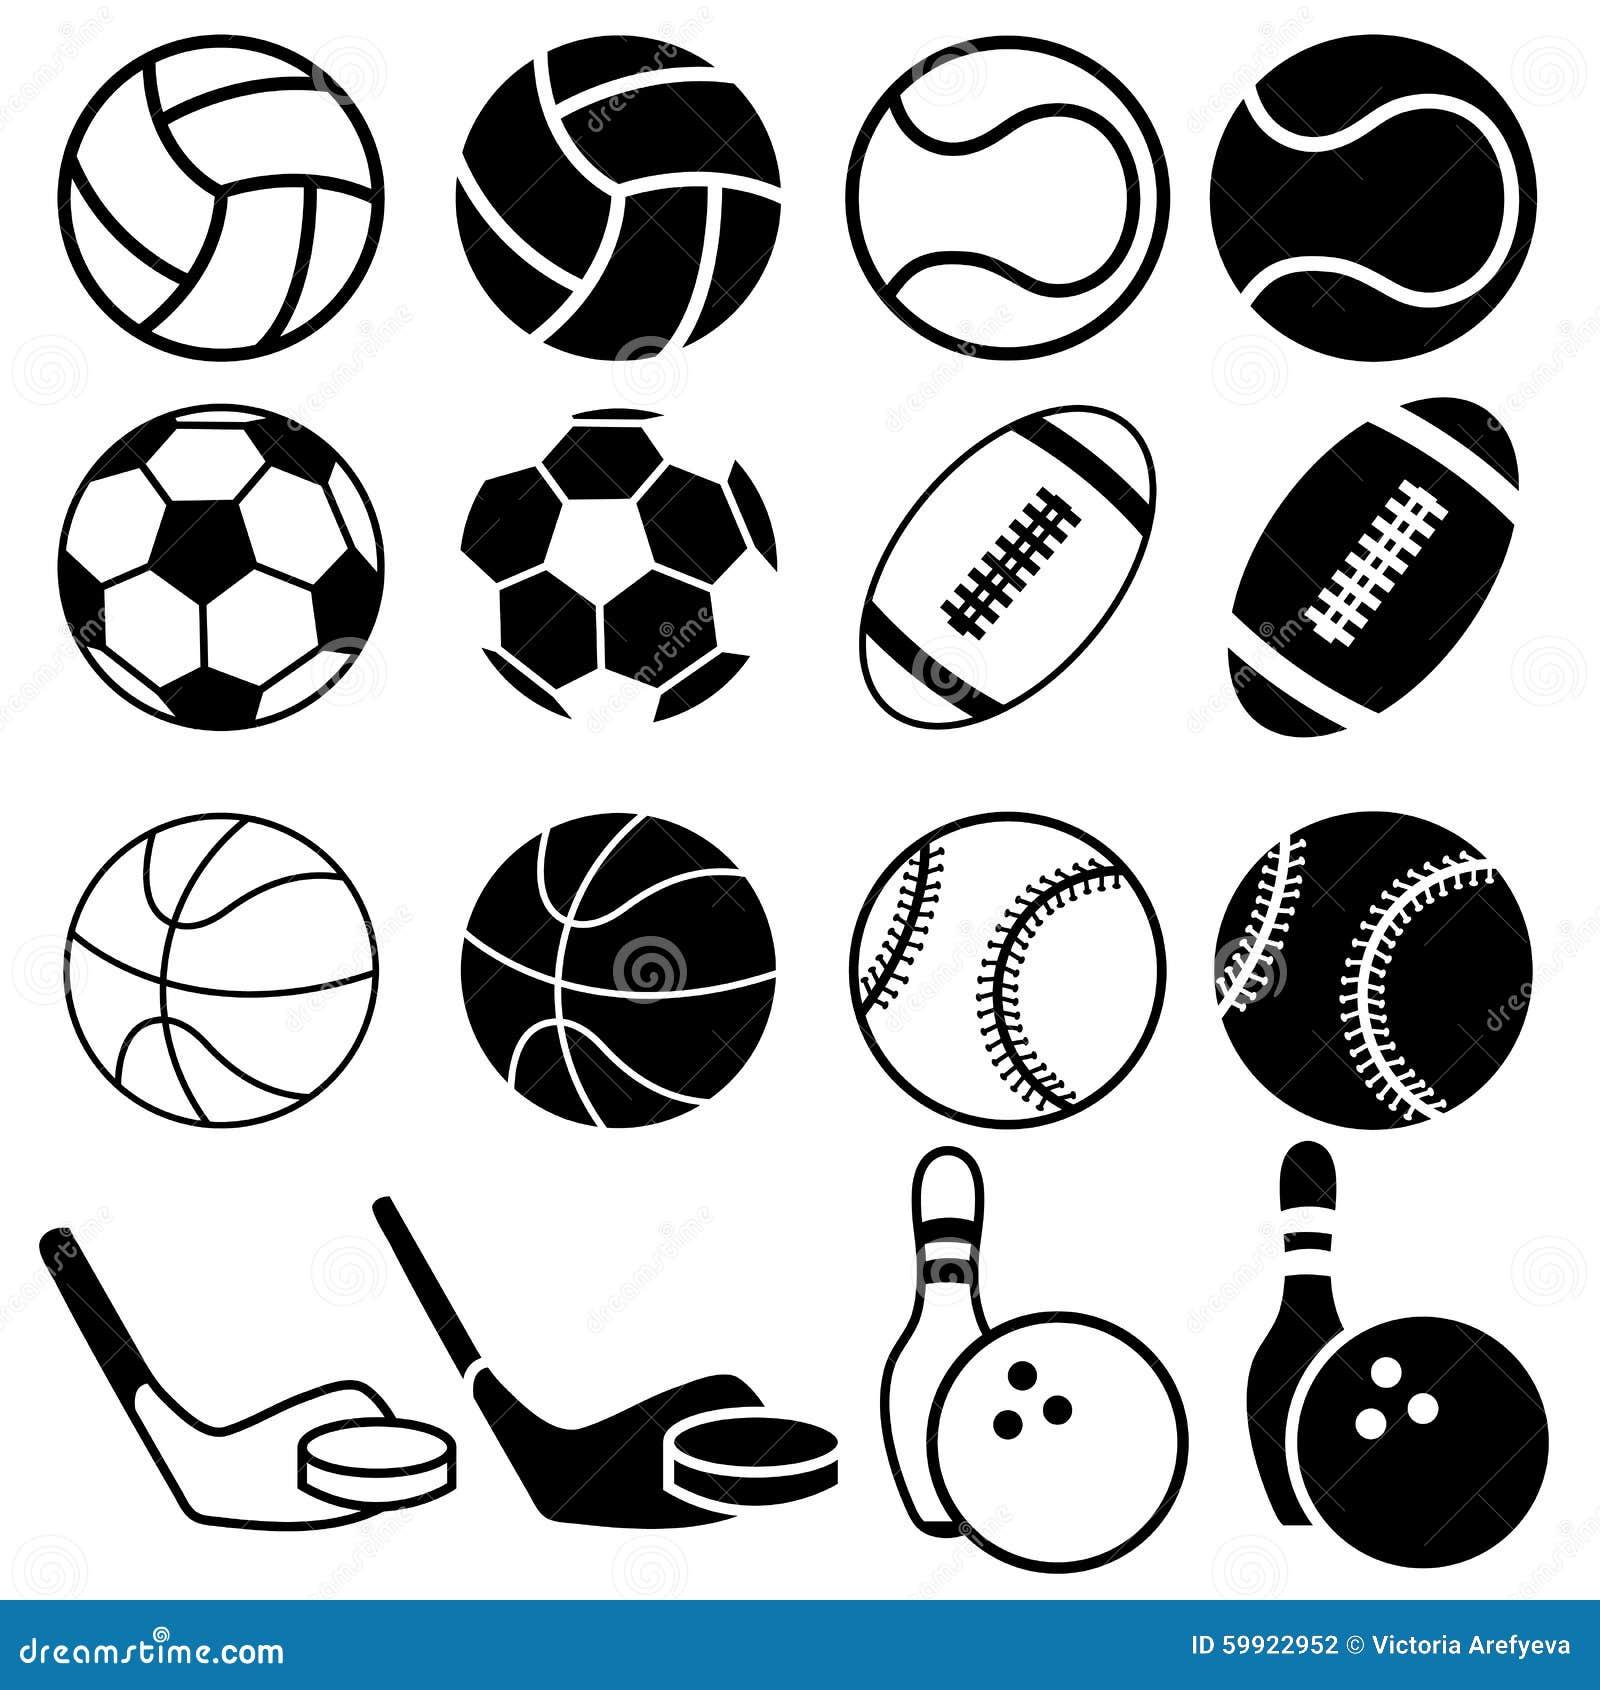 Sports Balls icons. stock illustration. Image of black ...